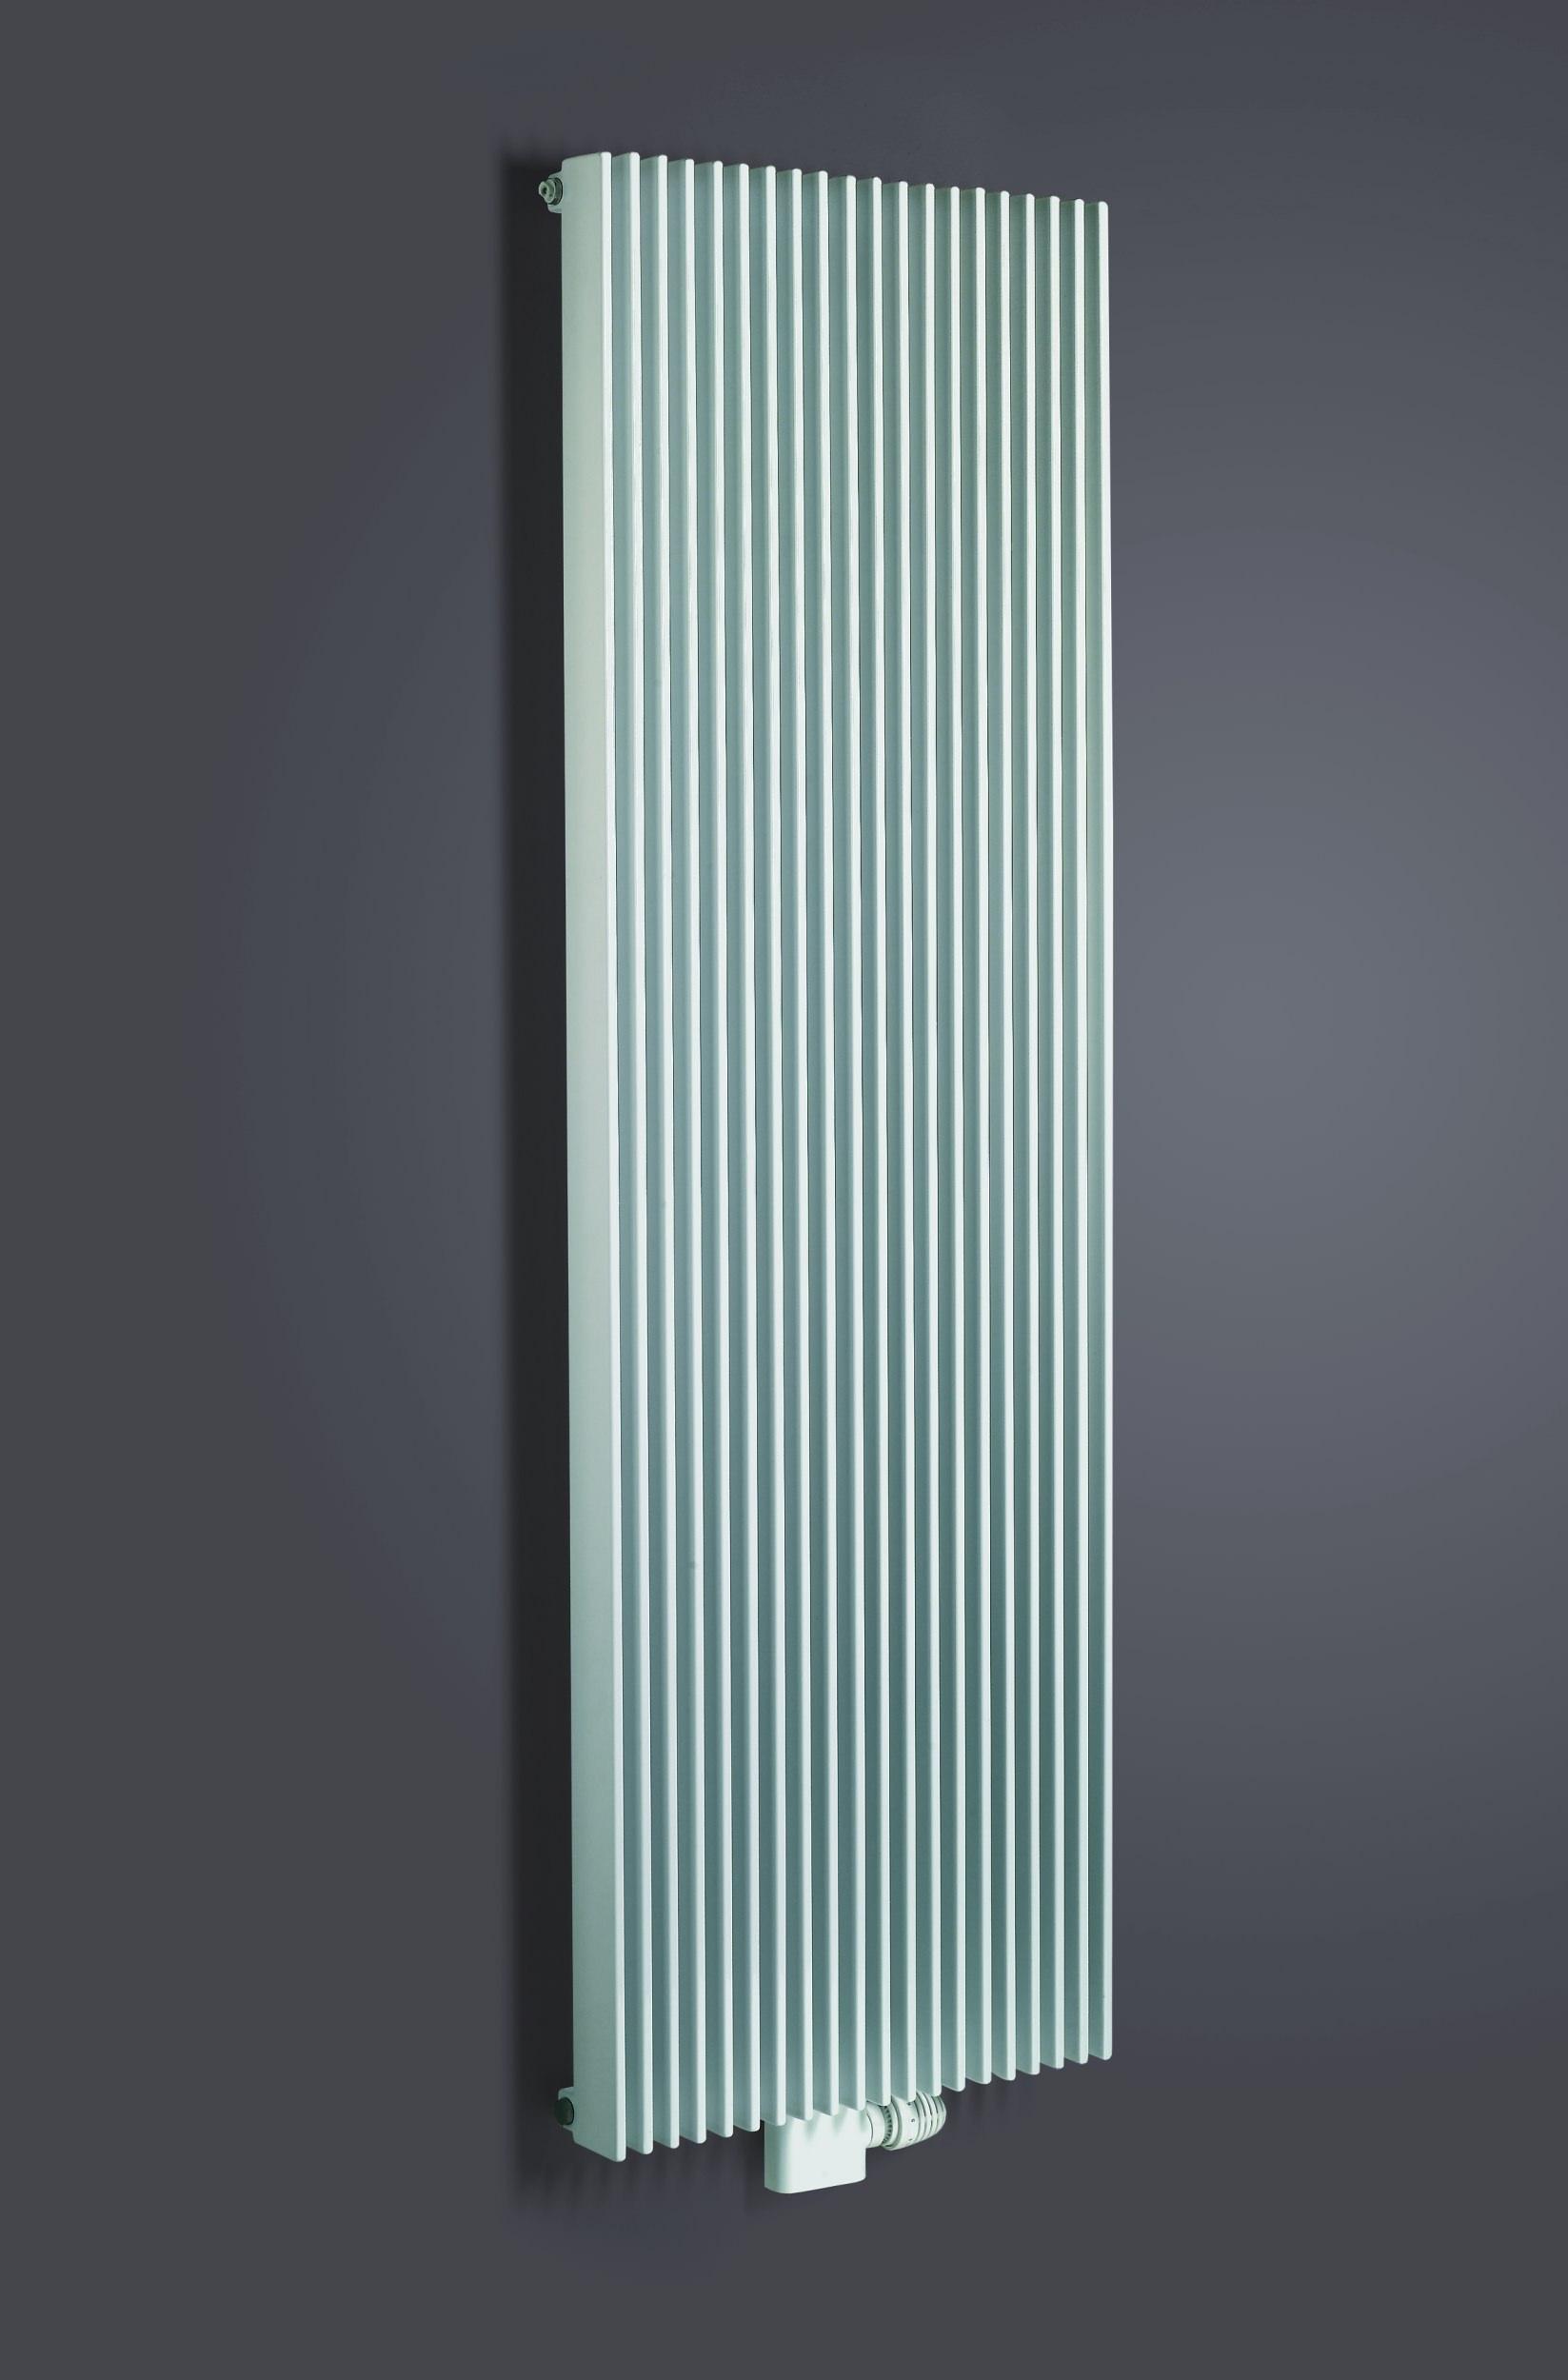 Schulte London Design-Heizkörper Sondermaß (281 - 500 mm) Alpinweiß ...